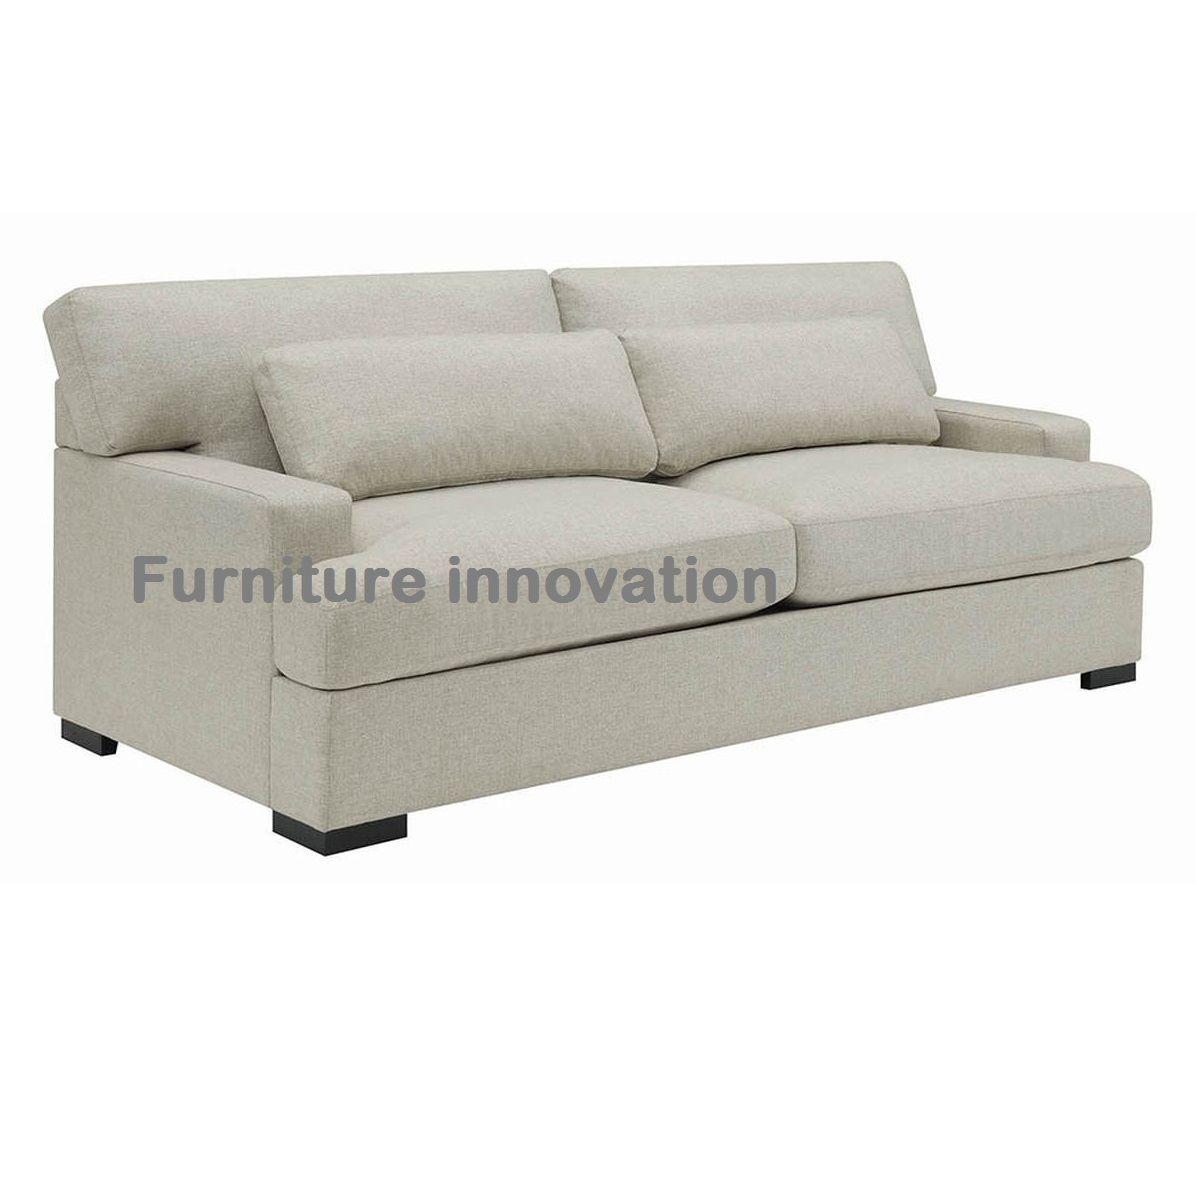 1cd7d12ae17d82 Furniture innovation 1635 Indiana St. San Francisco